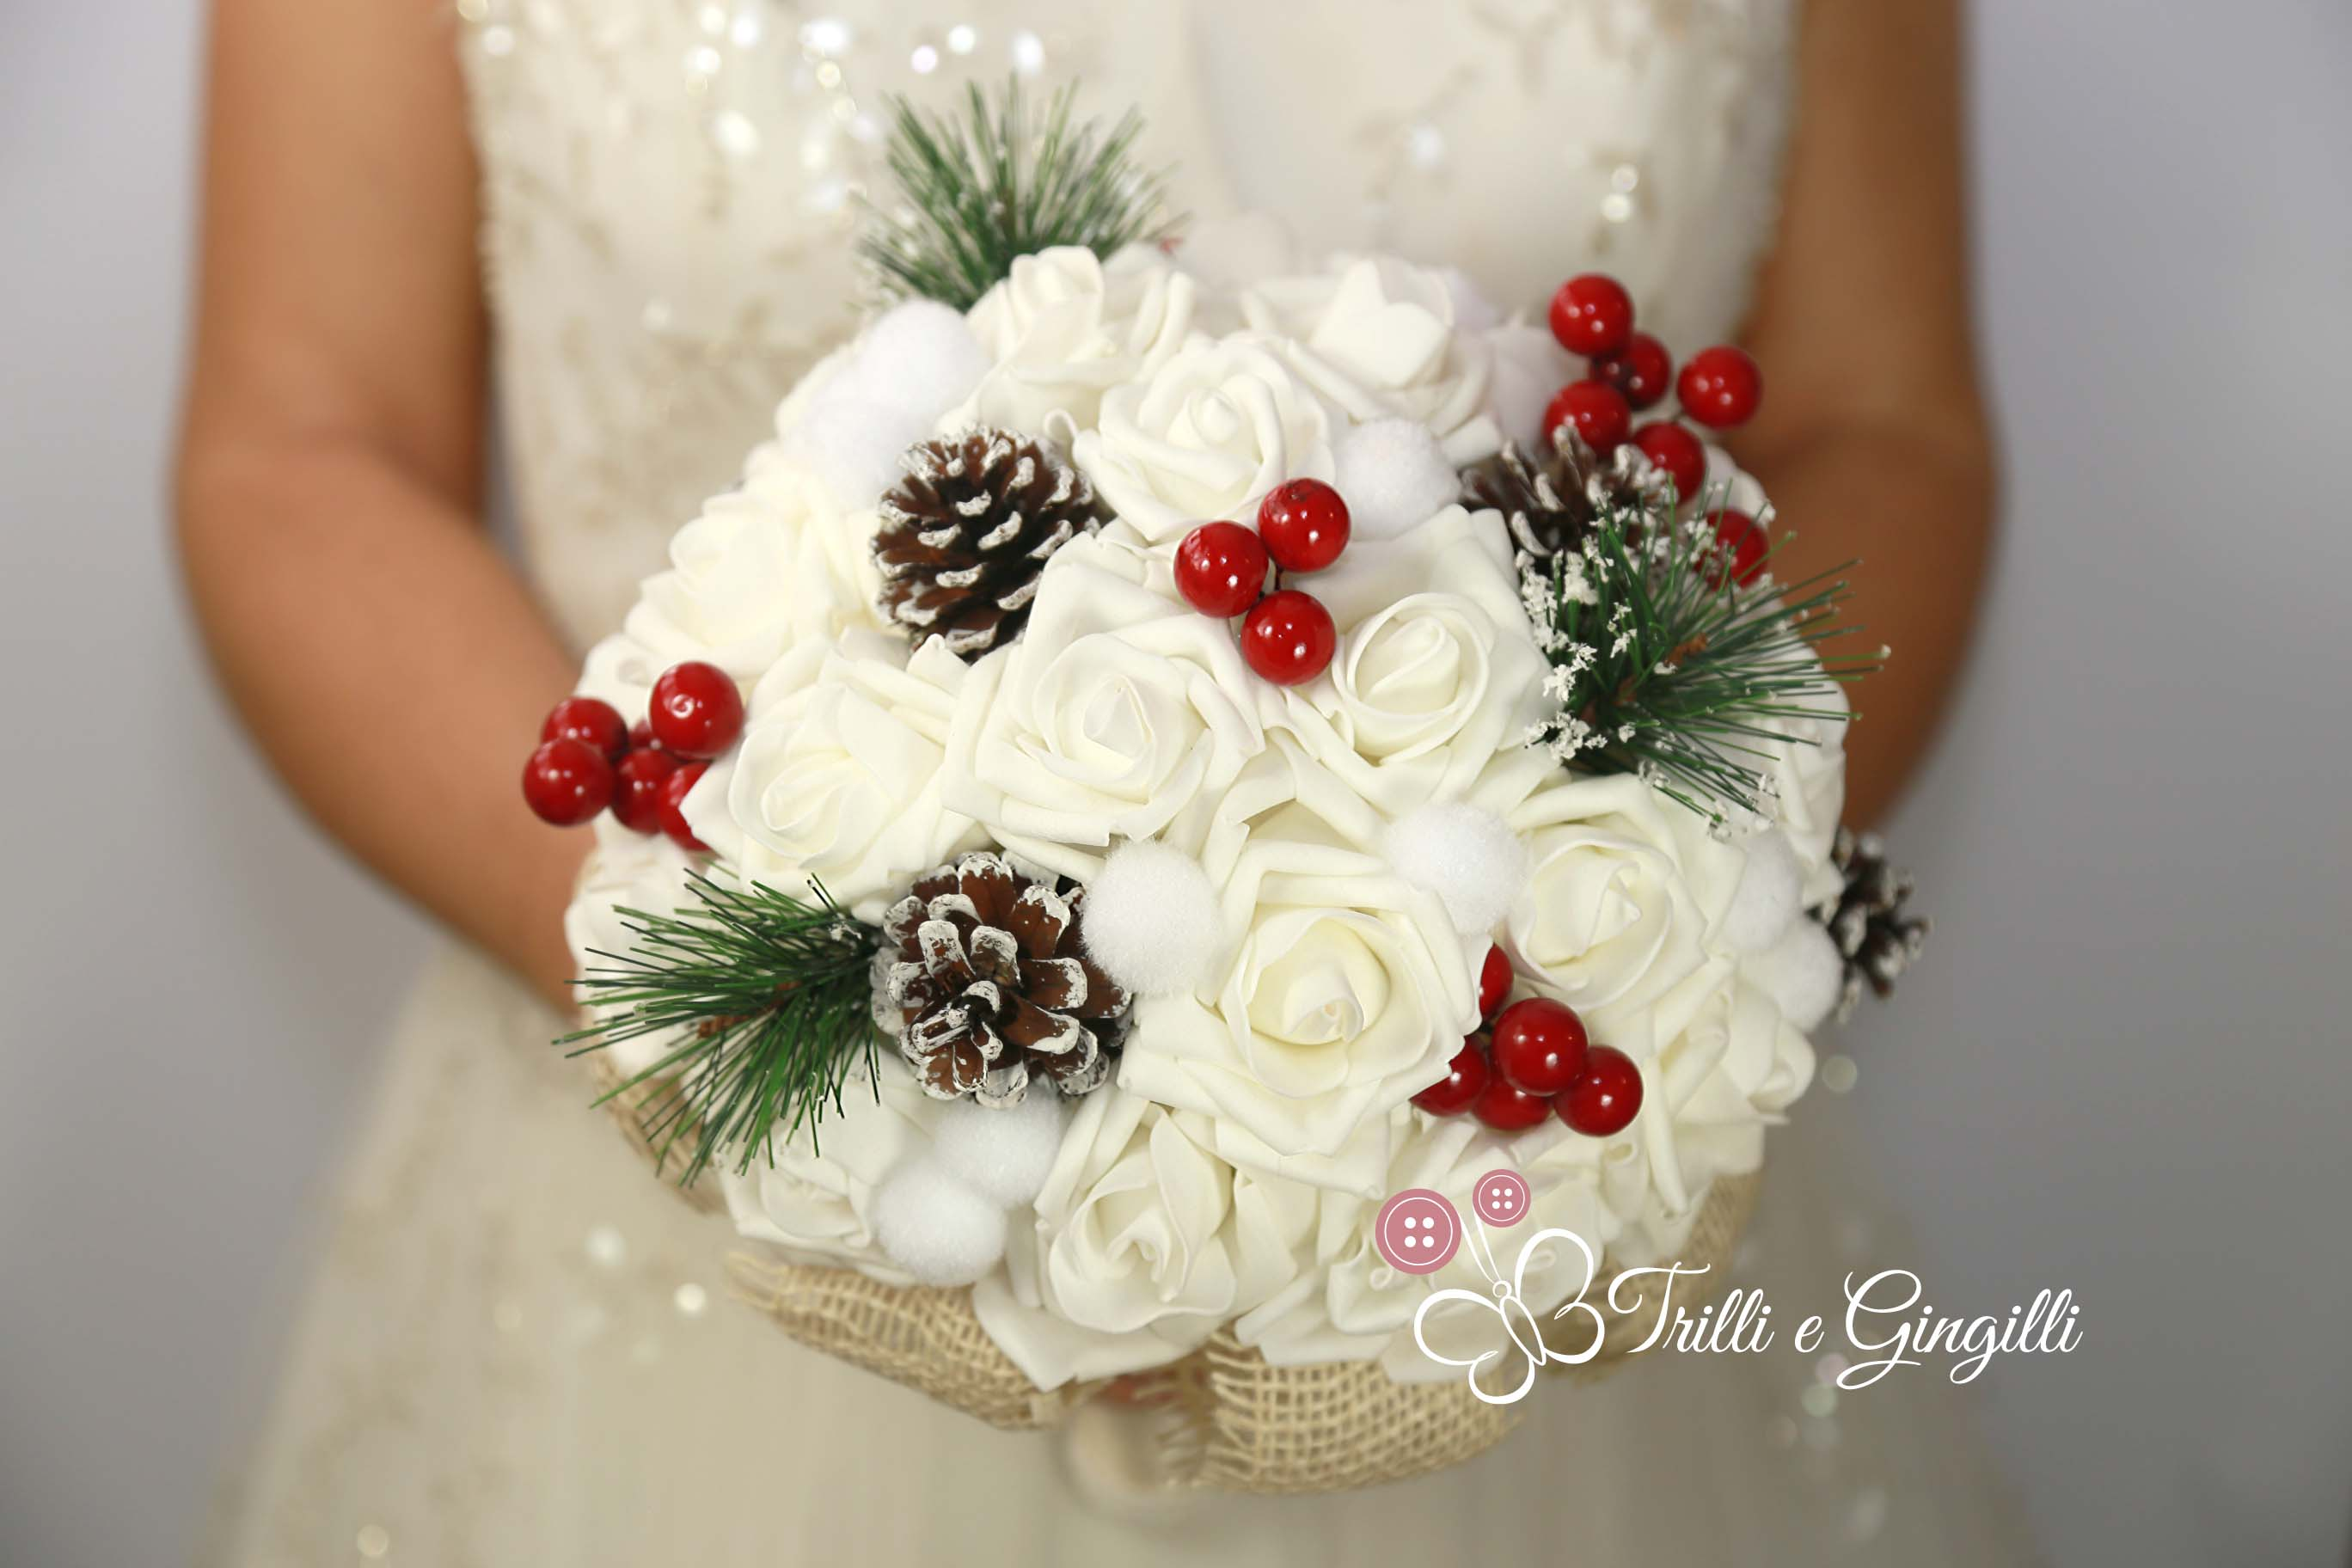 Wwwbouquet Sposait.Bouquet Invernale Tema Natalizio Rose Bianche Trilli E Gingilli